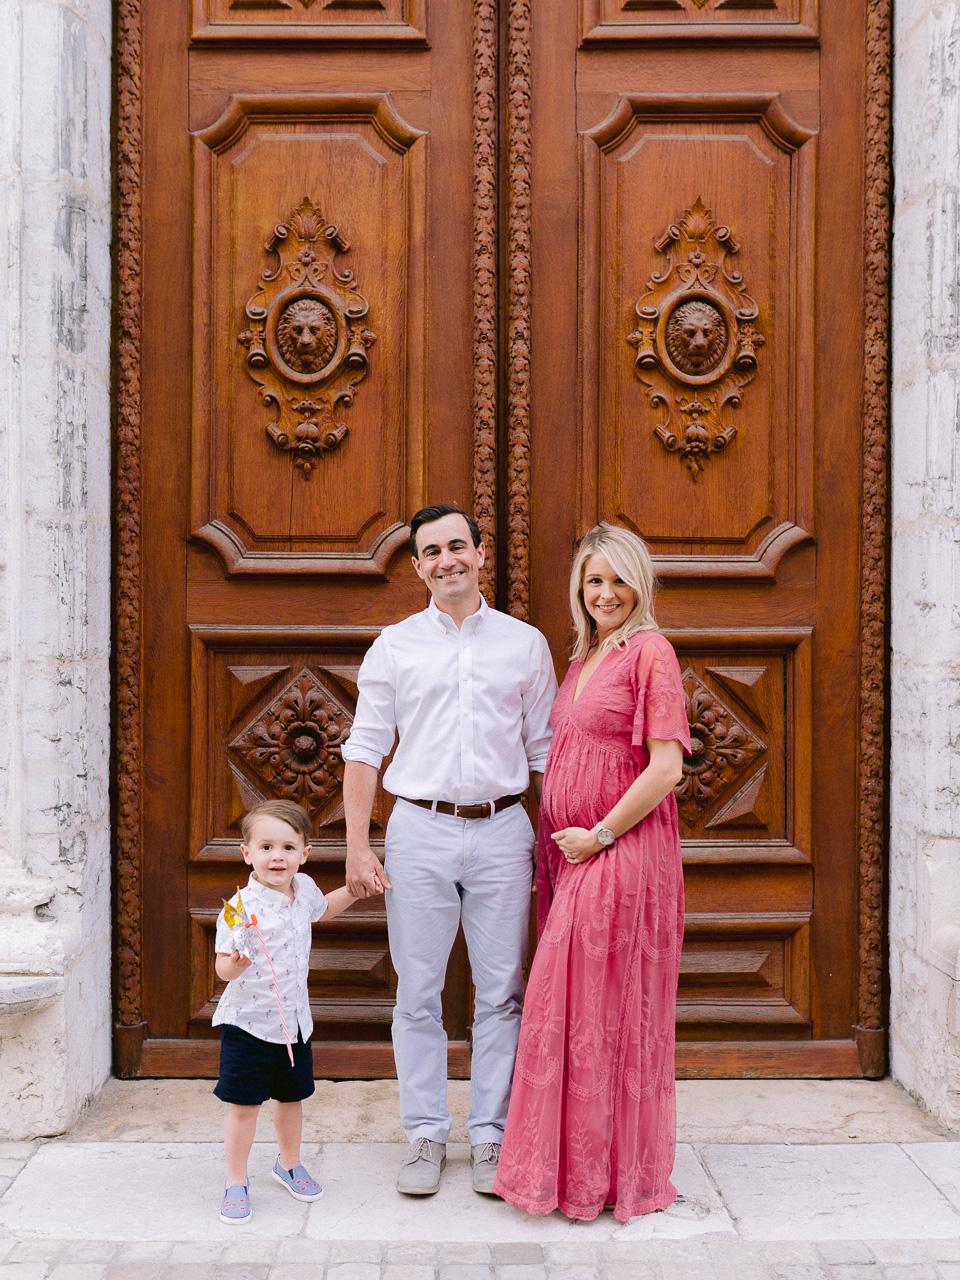 family_photoshoot_france.jpg